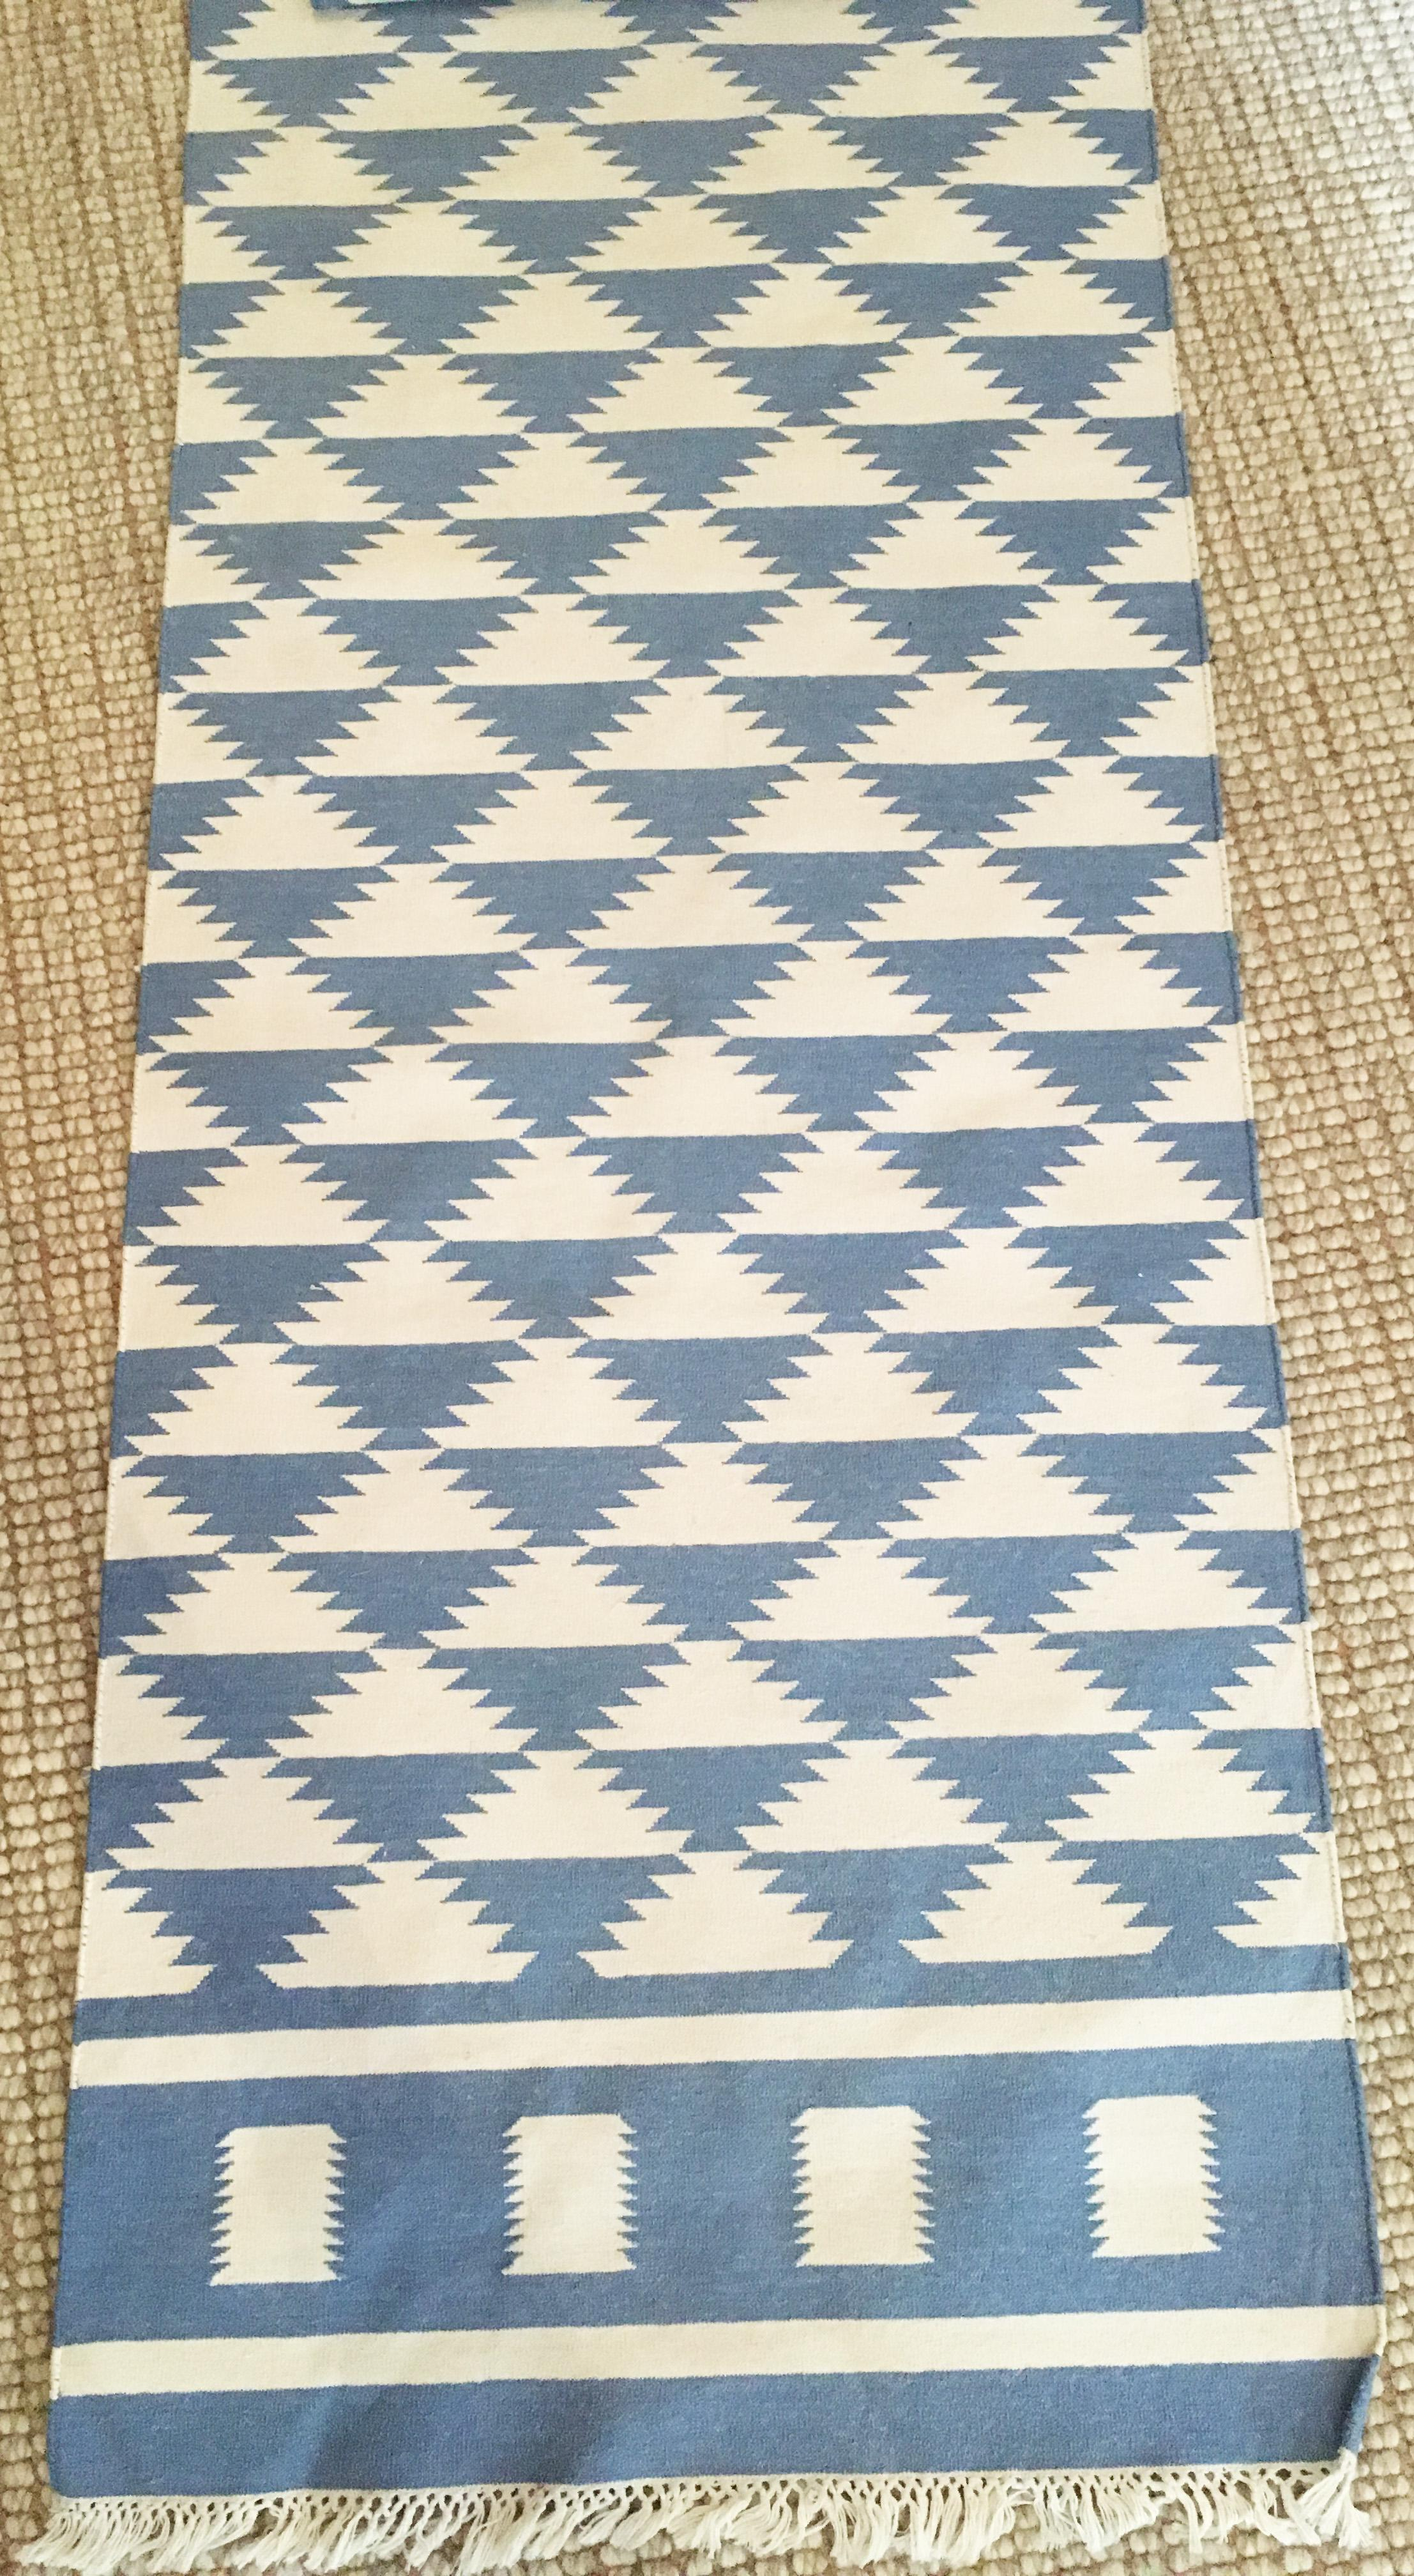 tribal aztec pattern runner rug 2 7 x 20 chairish